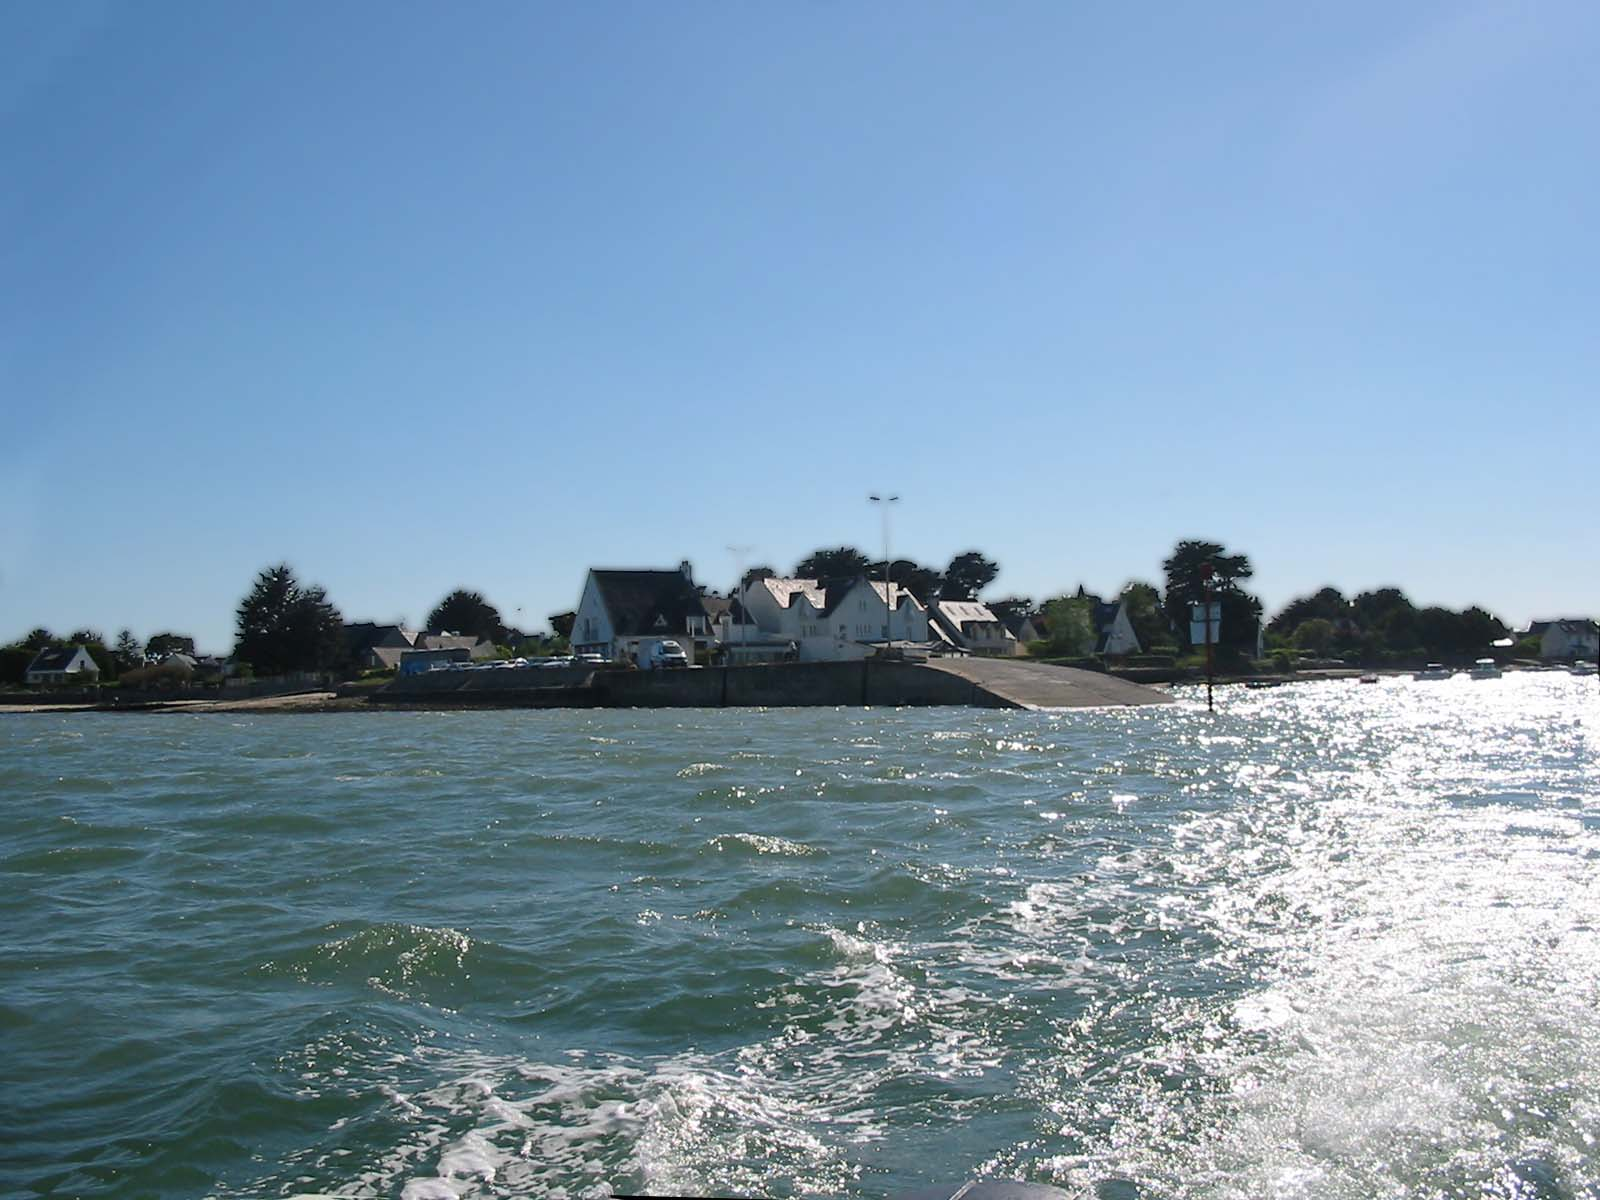 Fond ecran gratuit mer for Agence lignes paysage